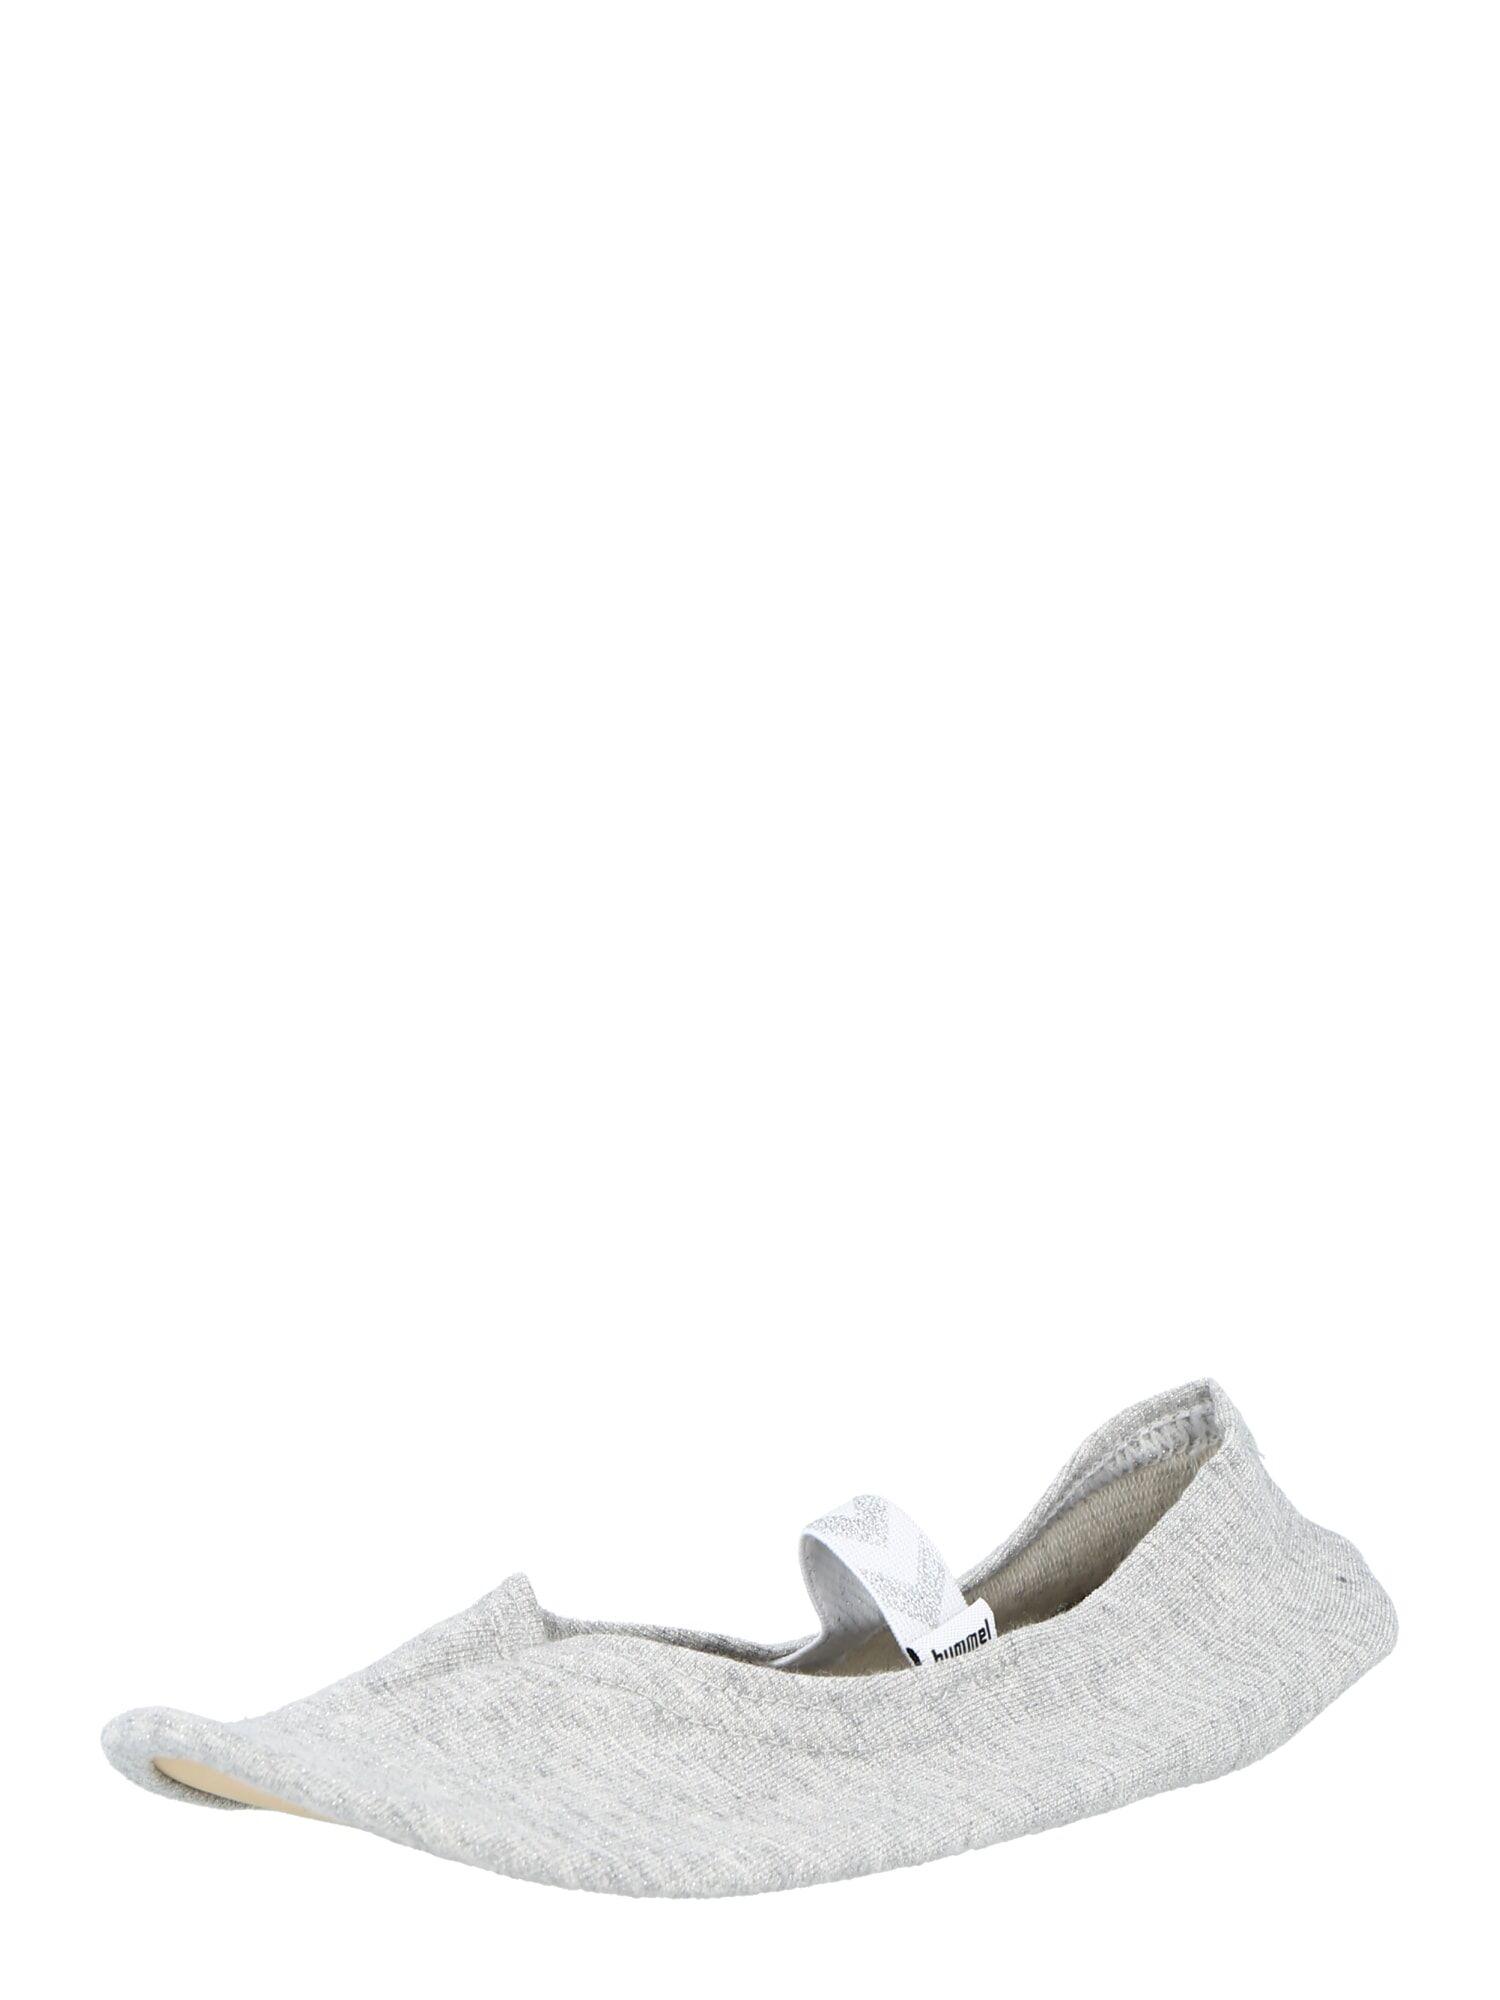 Hummel Chaussure de sport  - Gris - Taille: 26 - boy